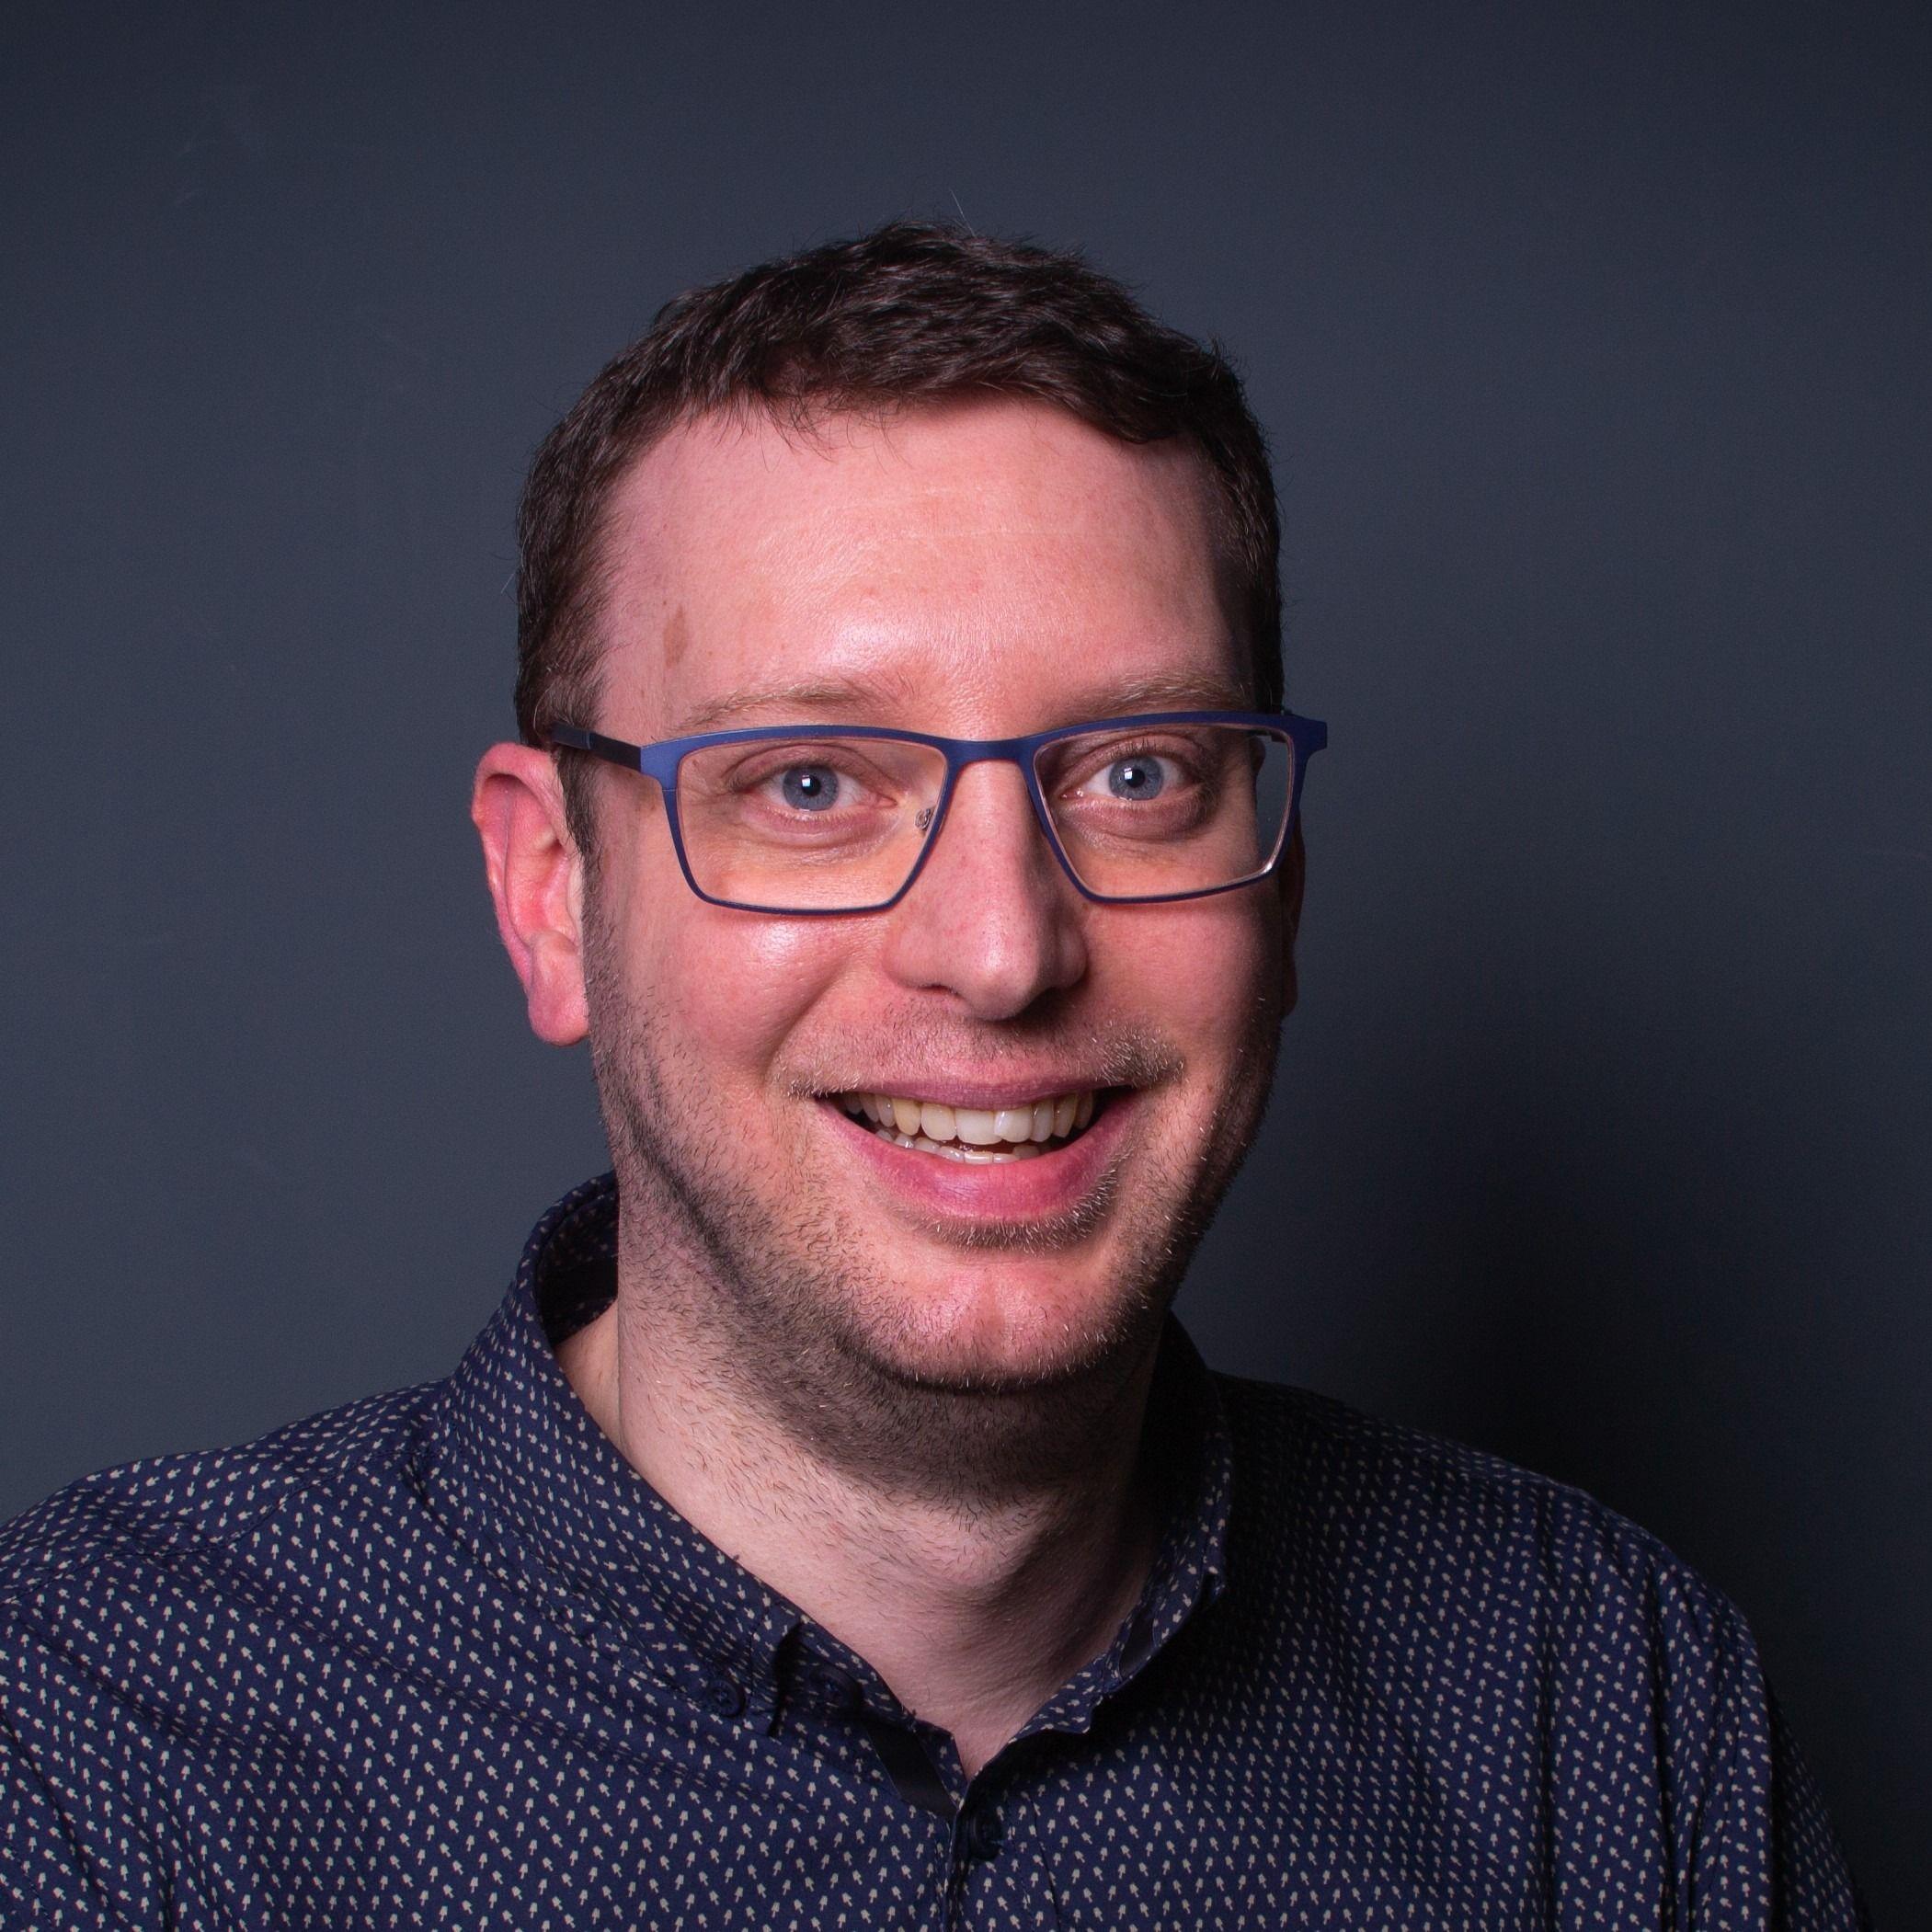 GraphQL with Maarten Louage